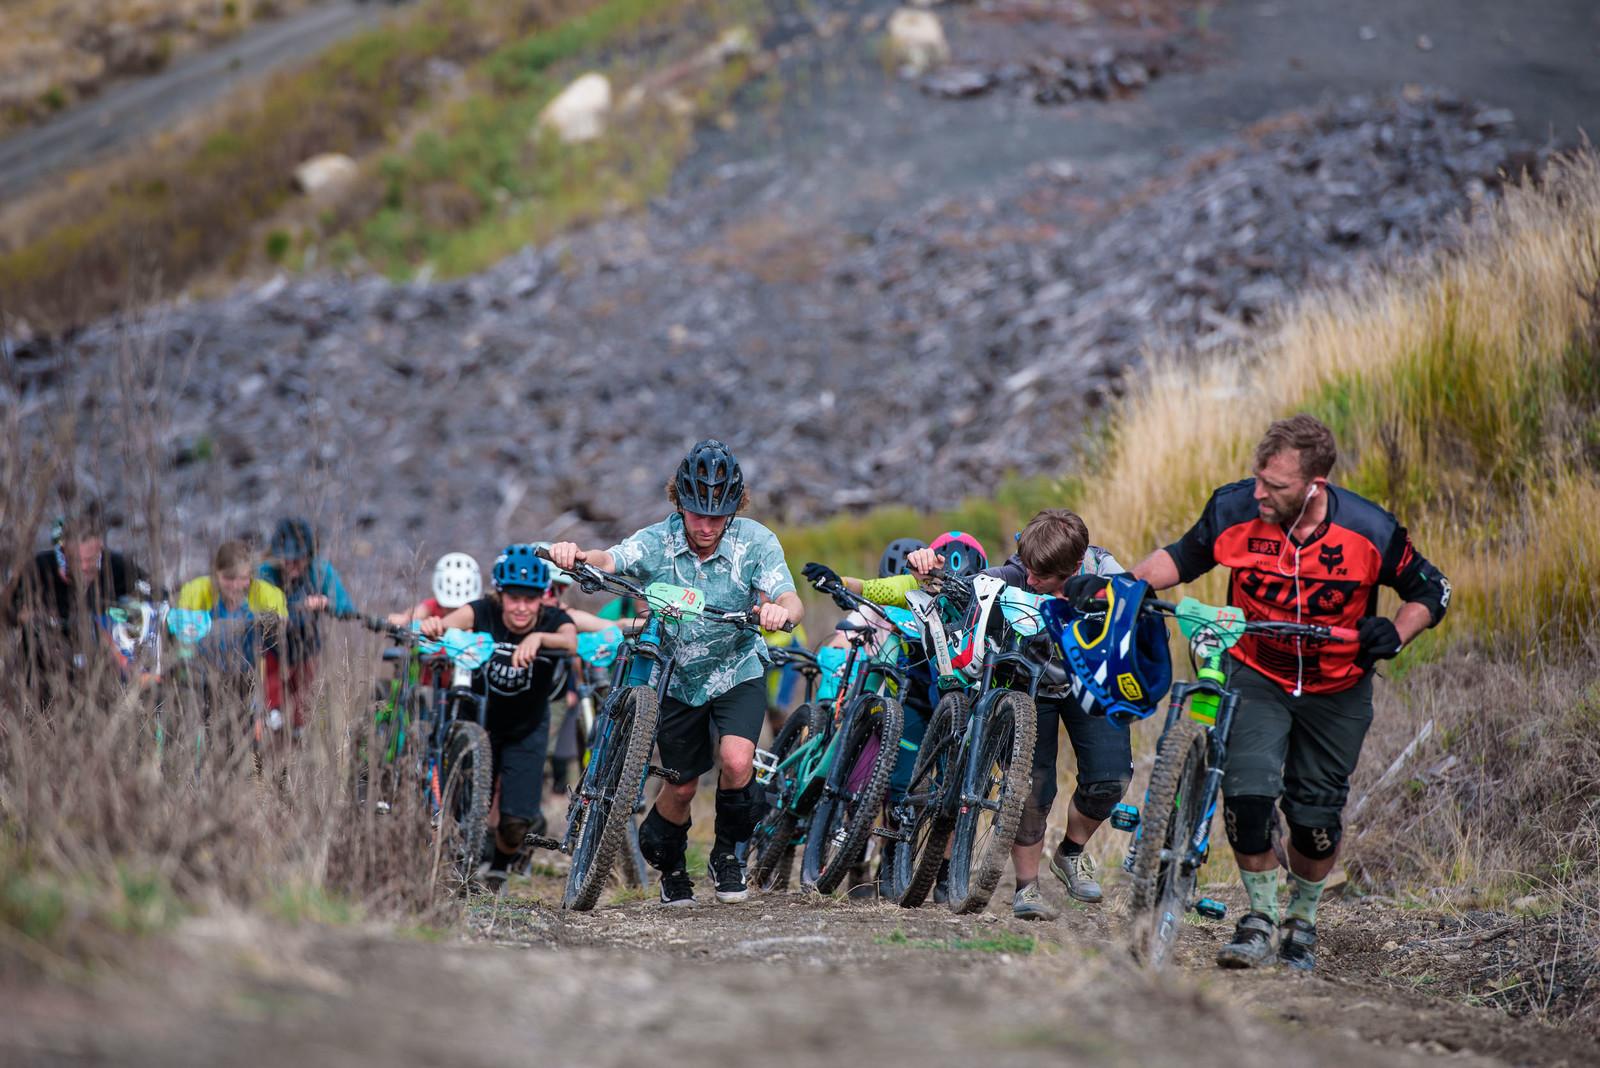 NZenduro19 day 3 DShaw-8133 - 2019 NZ Enduro Day 3 Photo Gallery - Mountain Biking Pictures - Vital MTB